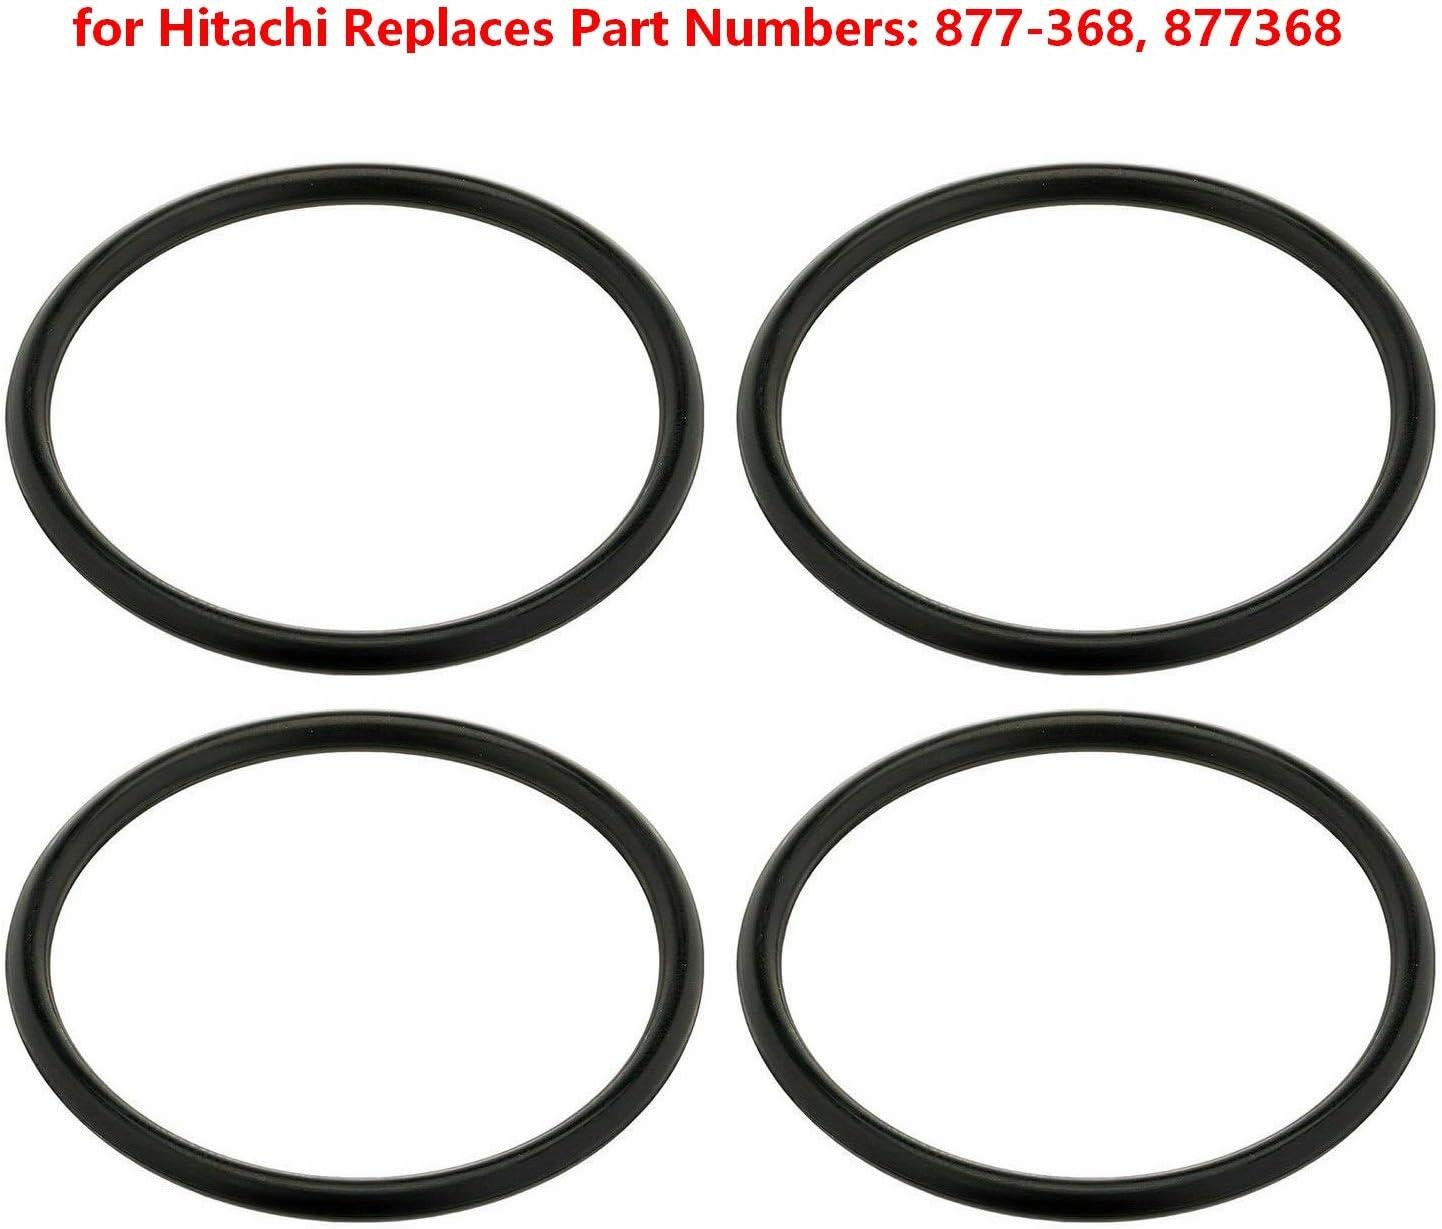 A2 Eagleggo 4 Pack Piston O-Rings for Hitachi Replaces Part ...